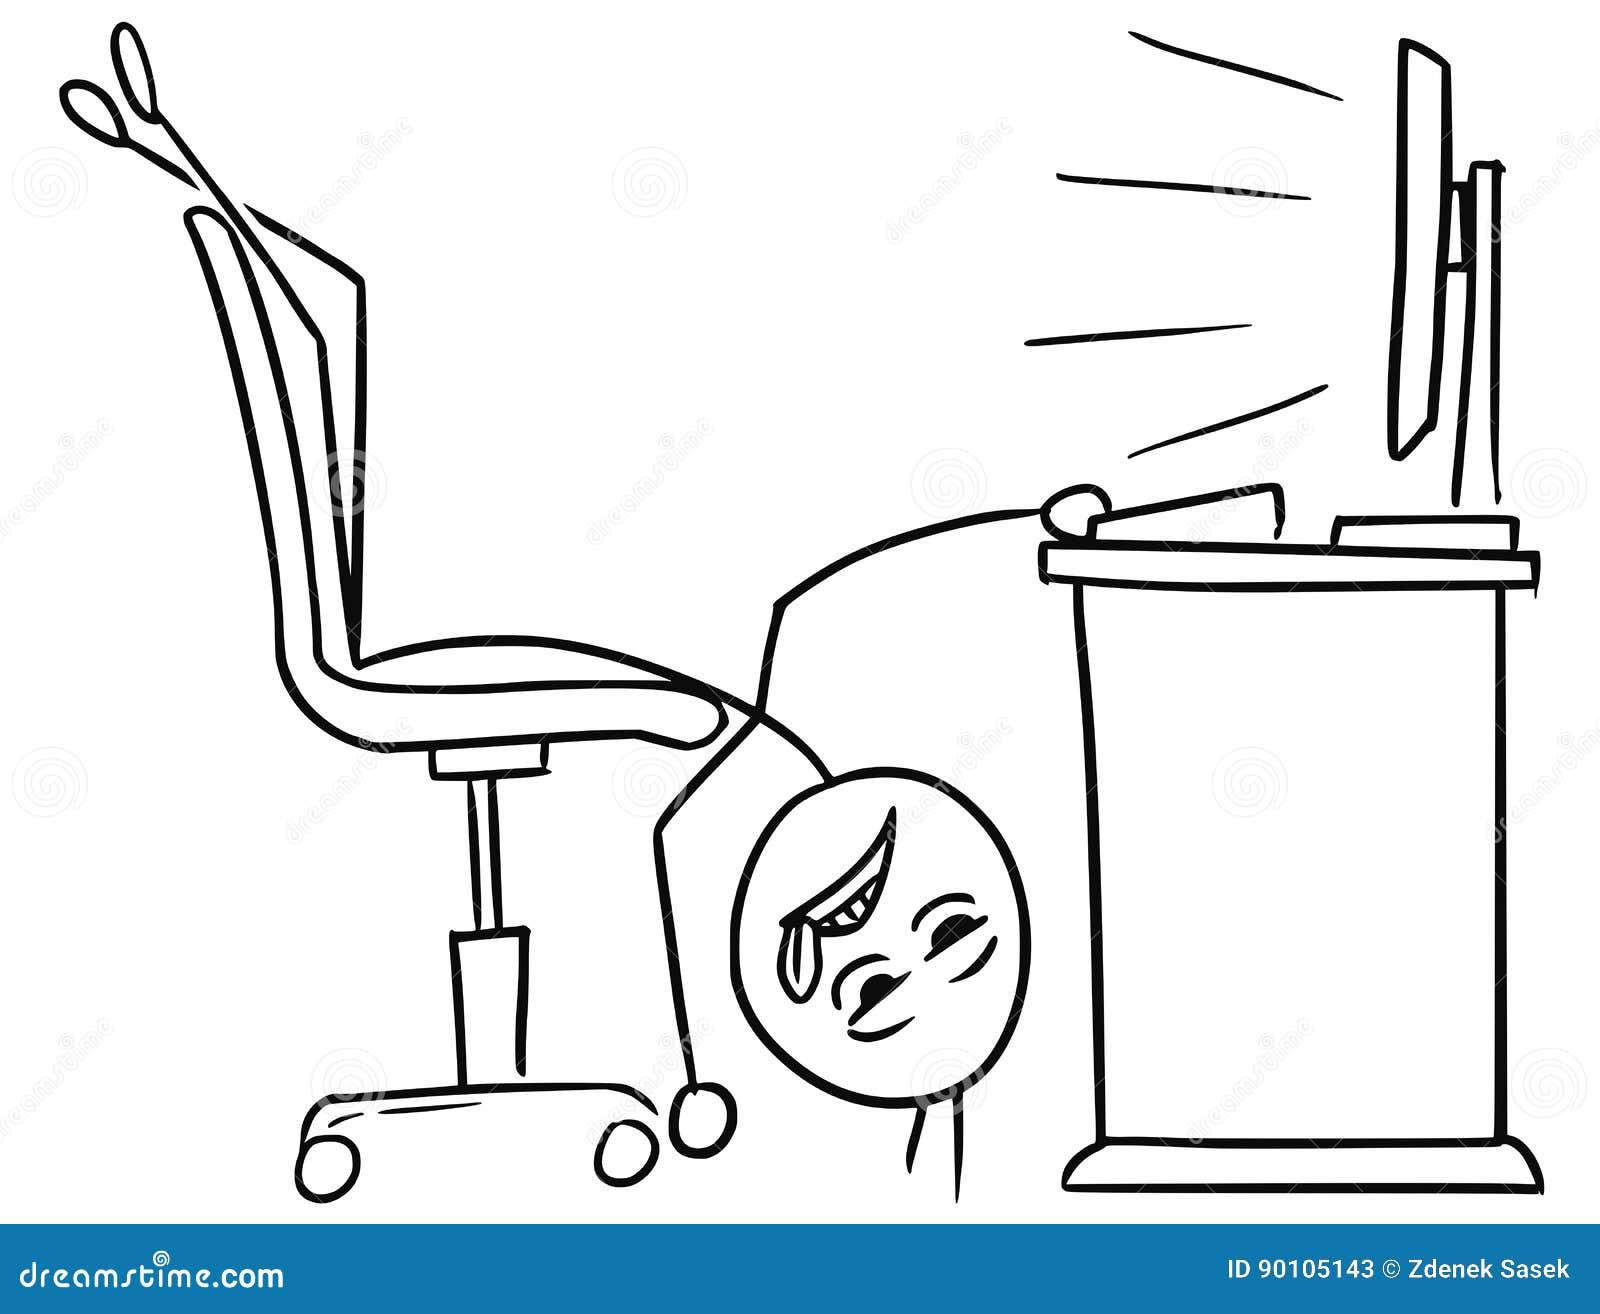 Astonishing Vector Stick Man Cartoon Of Man Lying On The Office Chair Download Free Architecture Designs Scobabritishbridgeorg